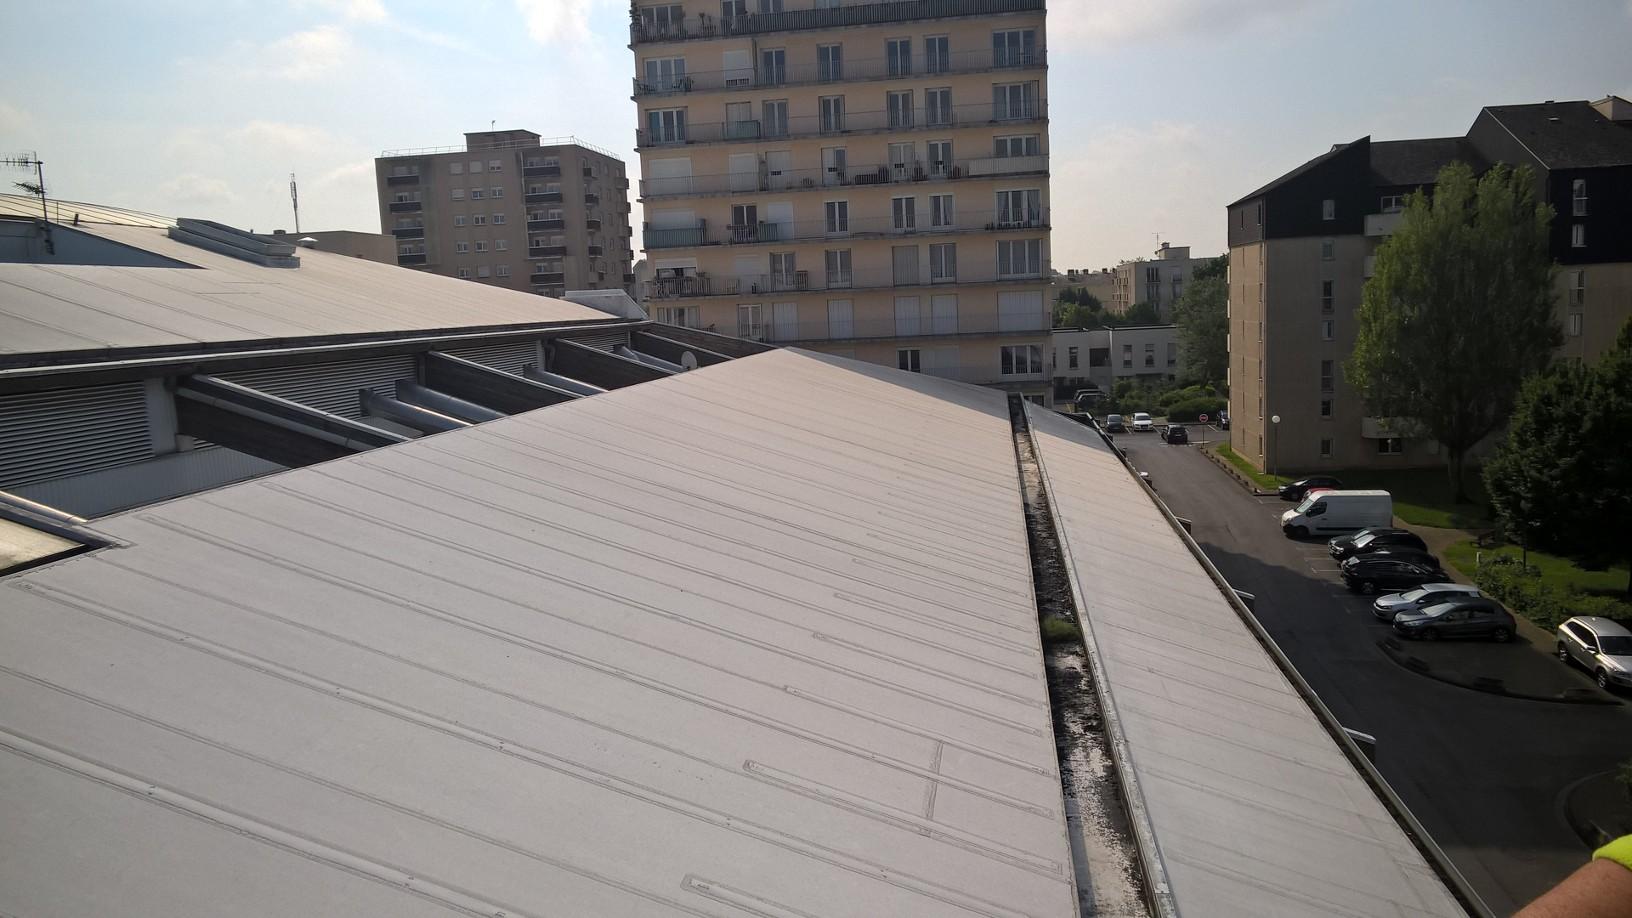 ac-bat-contrat-entretien-chenaux-lamorlaye-9